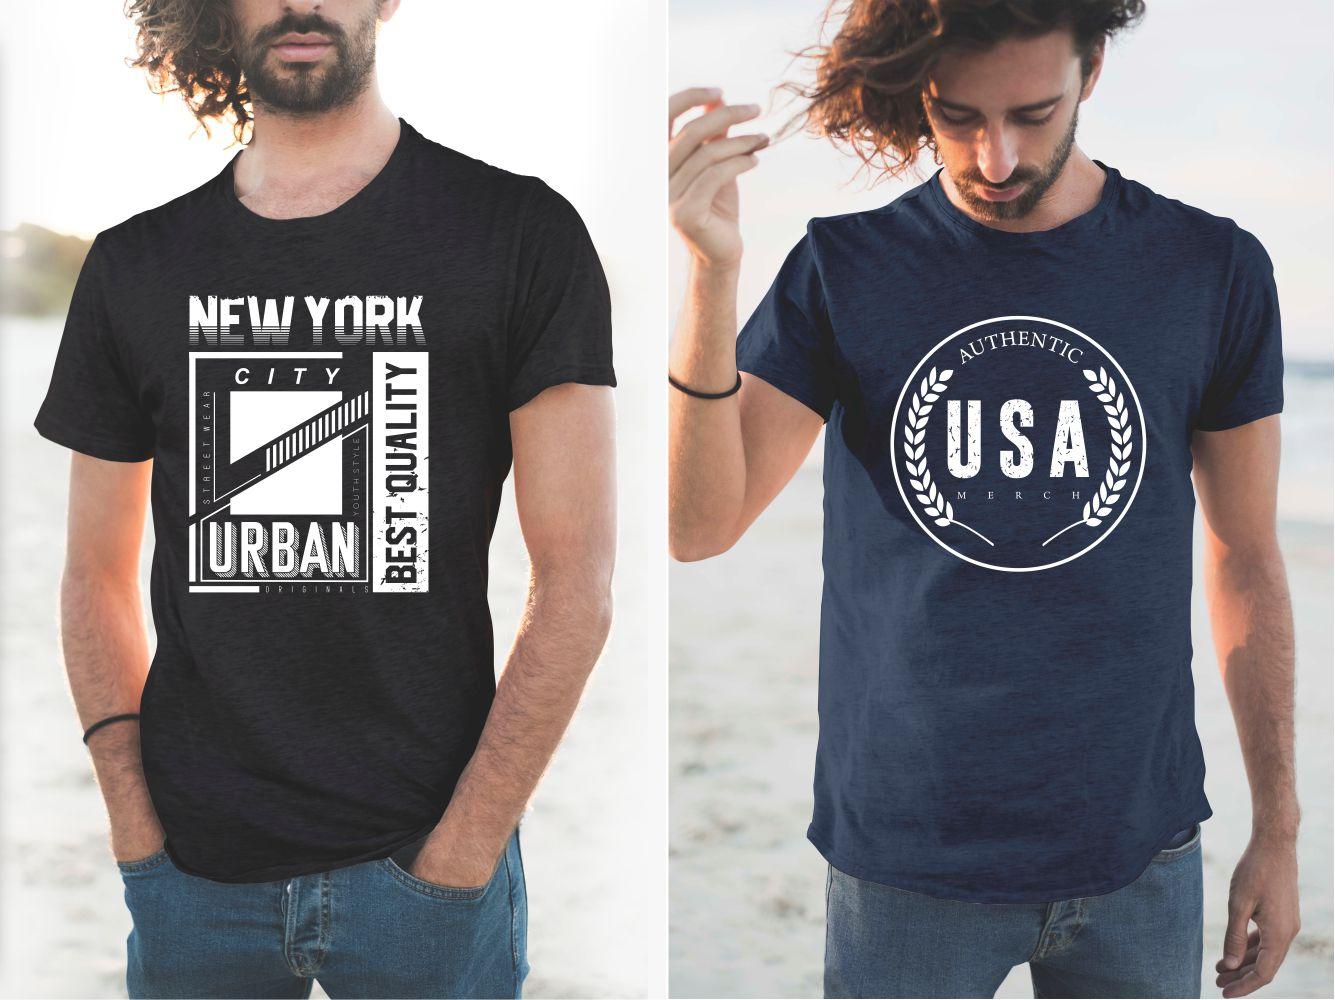 106 Urban T-shirt Designs Collection - 50